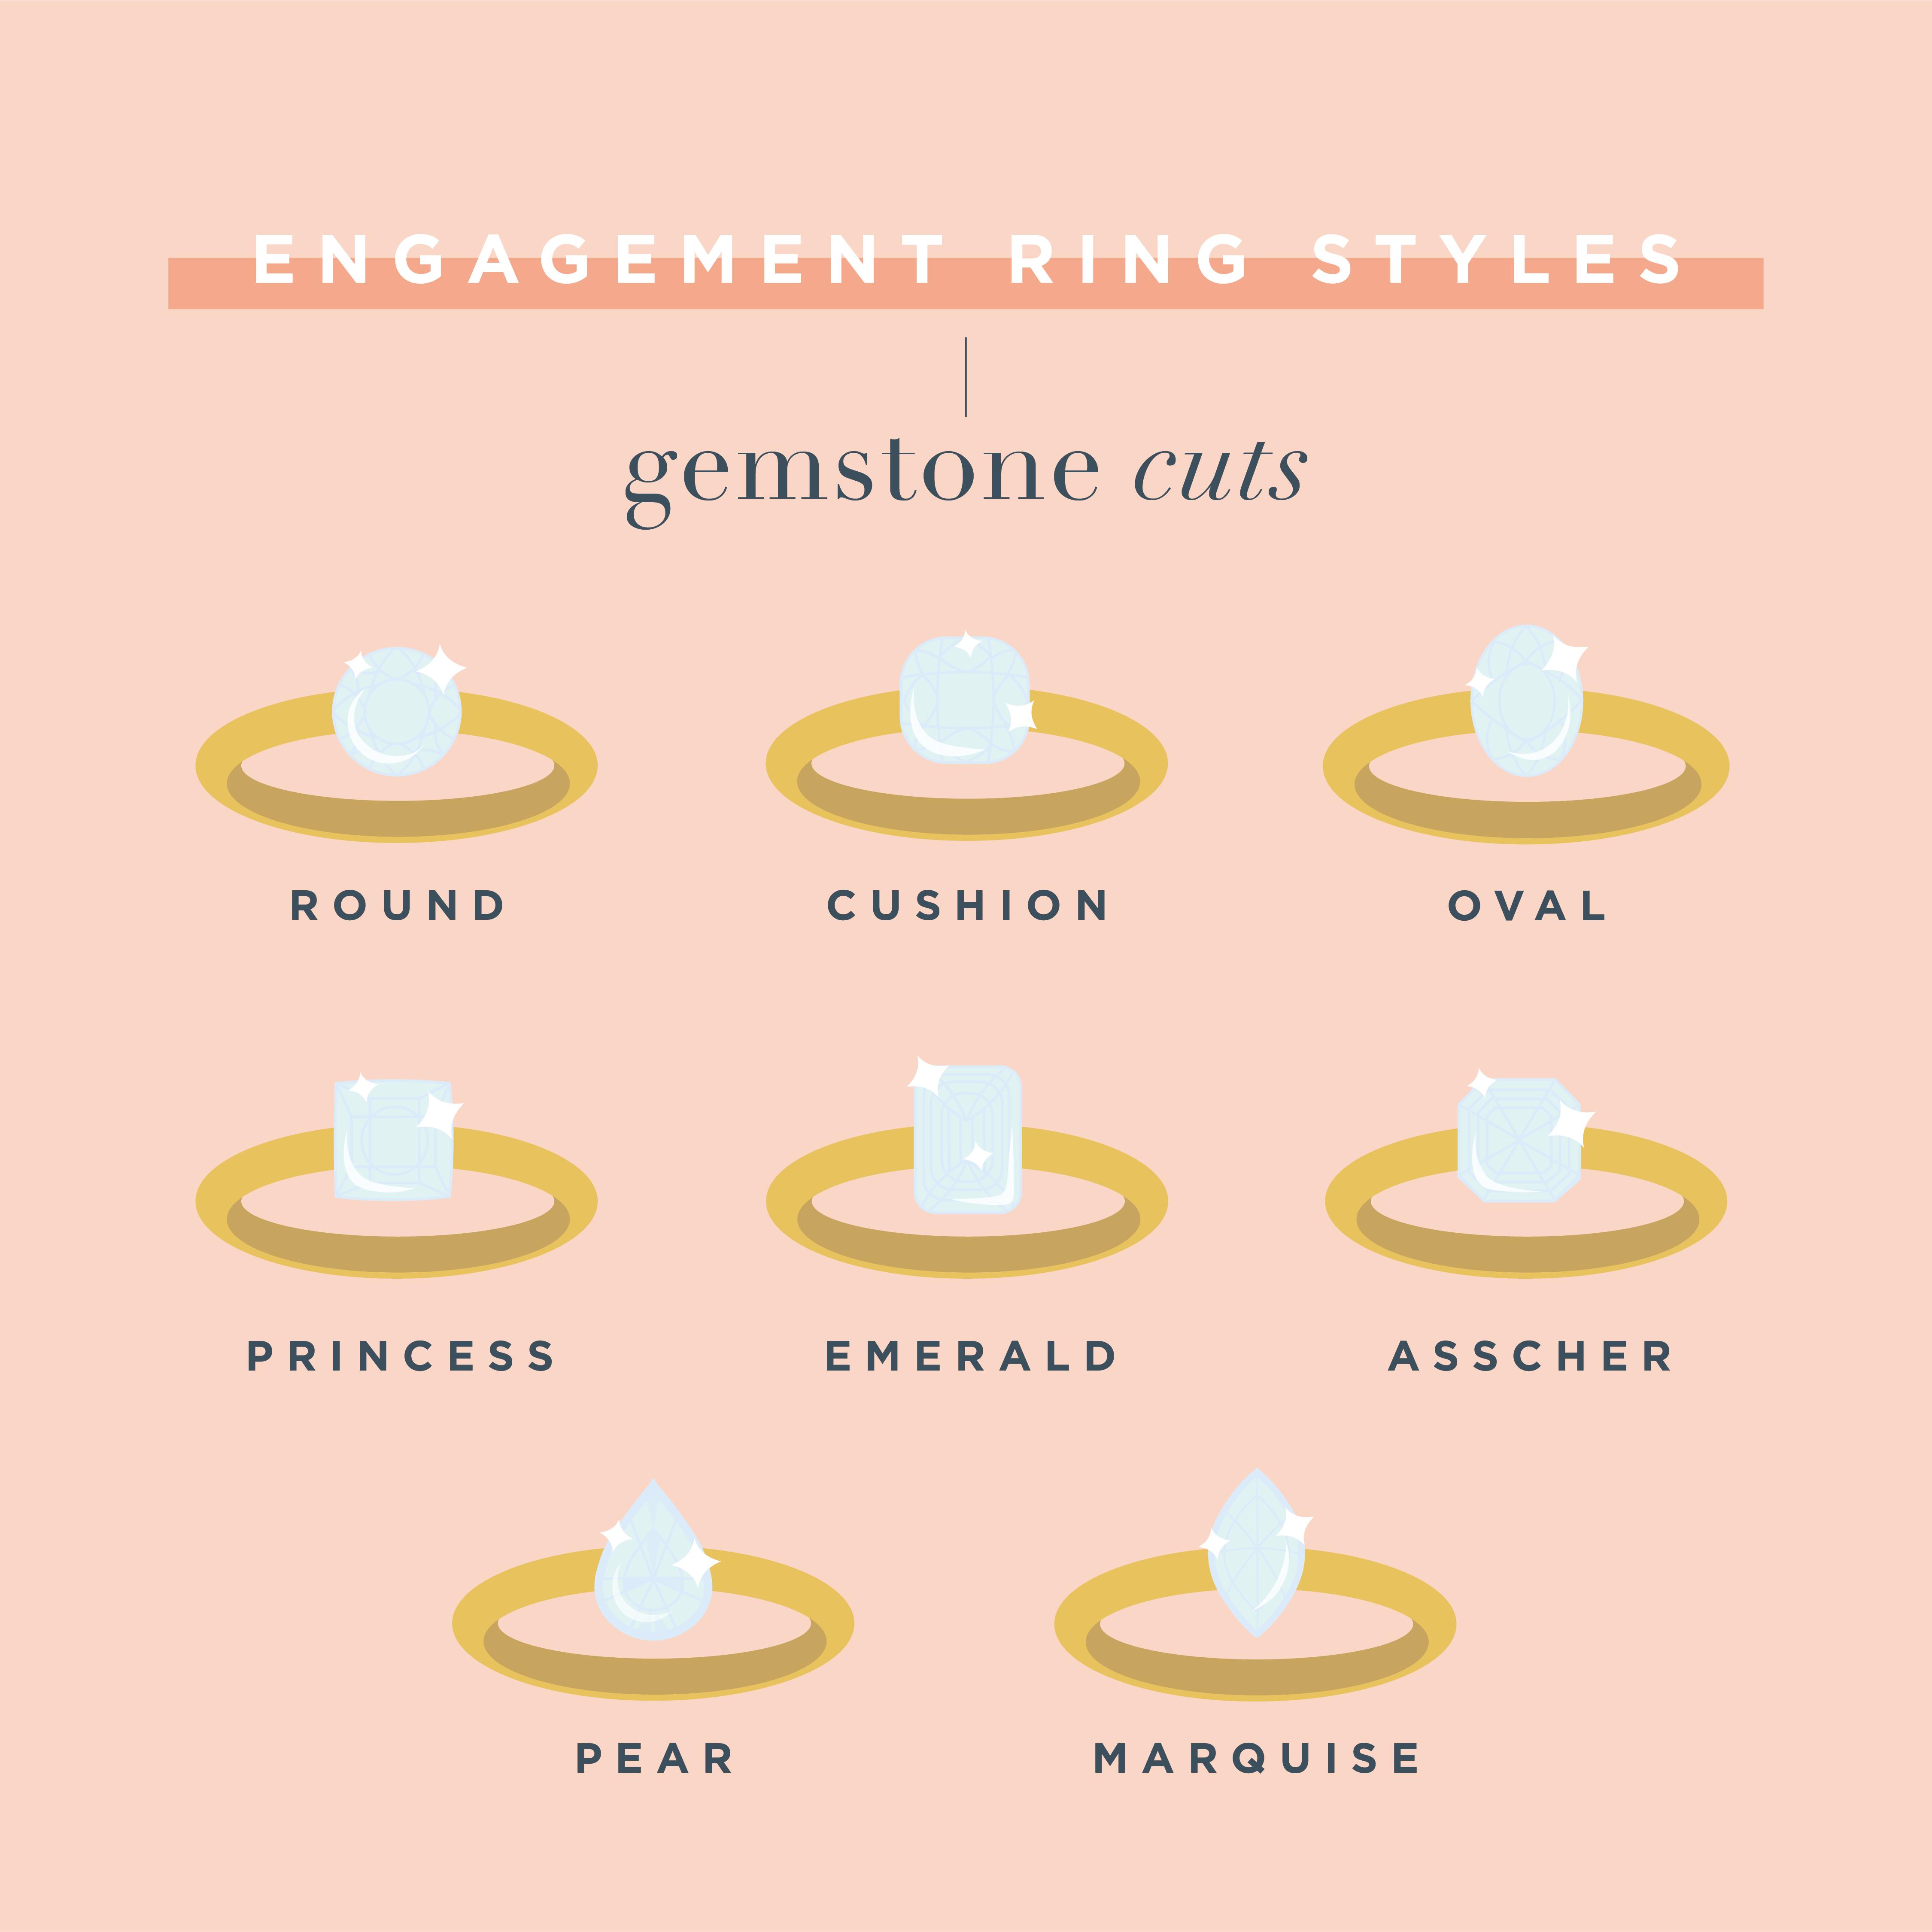 engagement ring styles - gemstone cuts